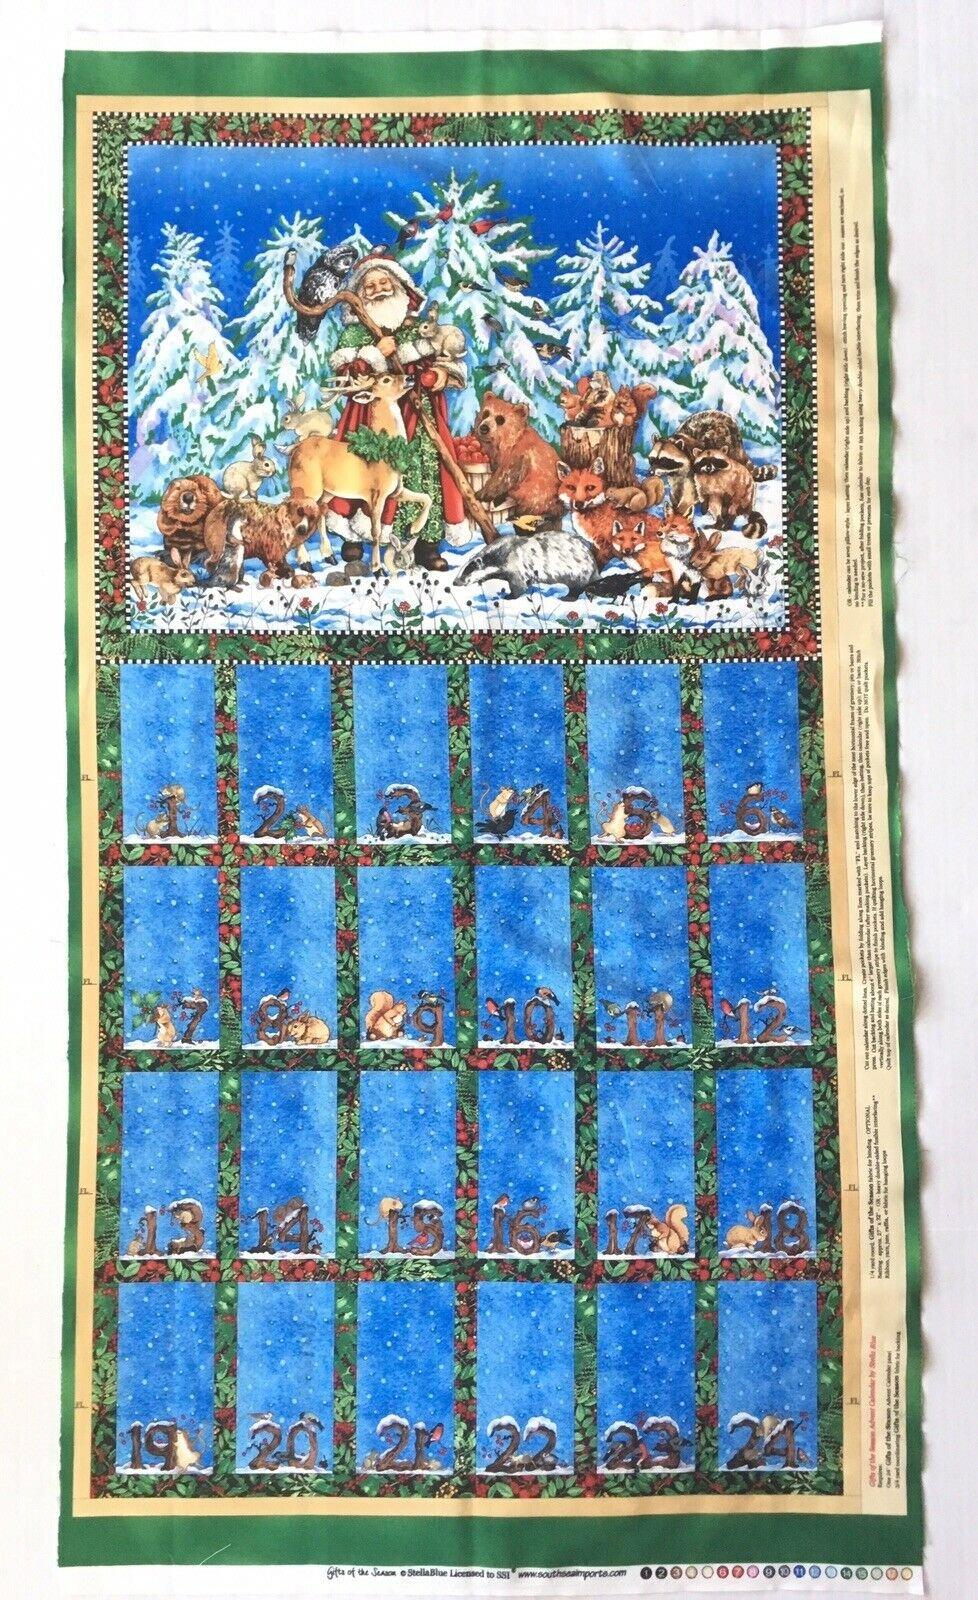 Gifts of the Season - Advent Calendar